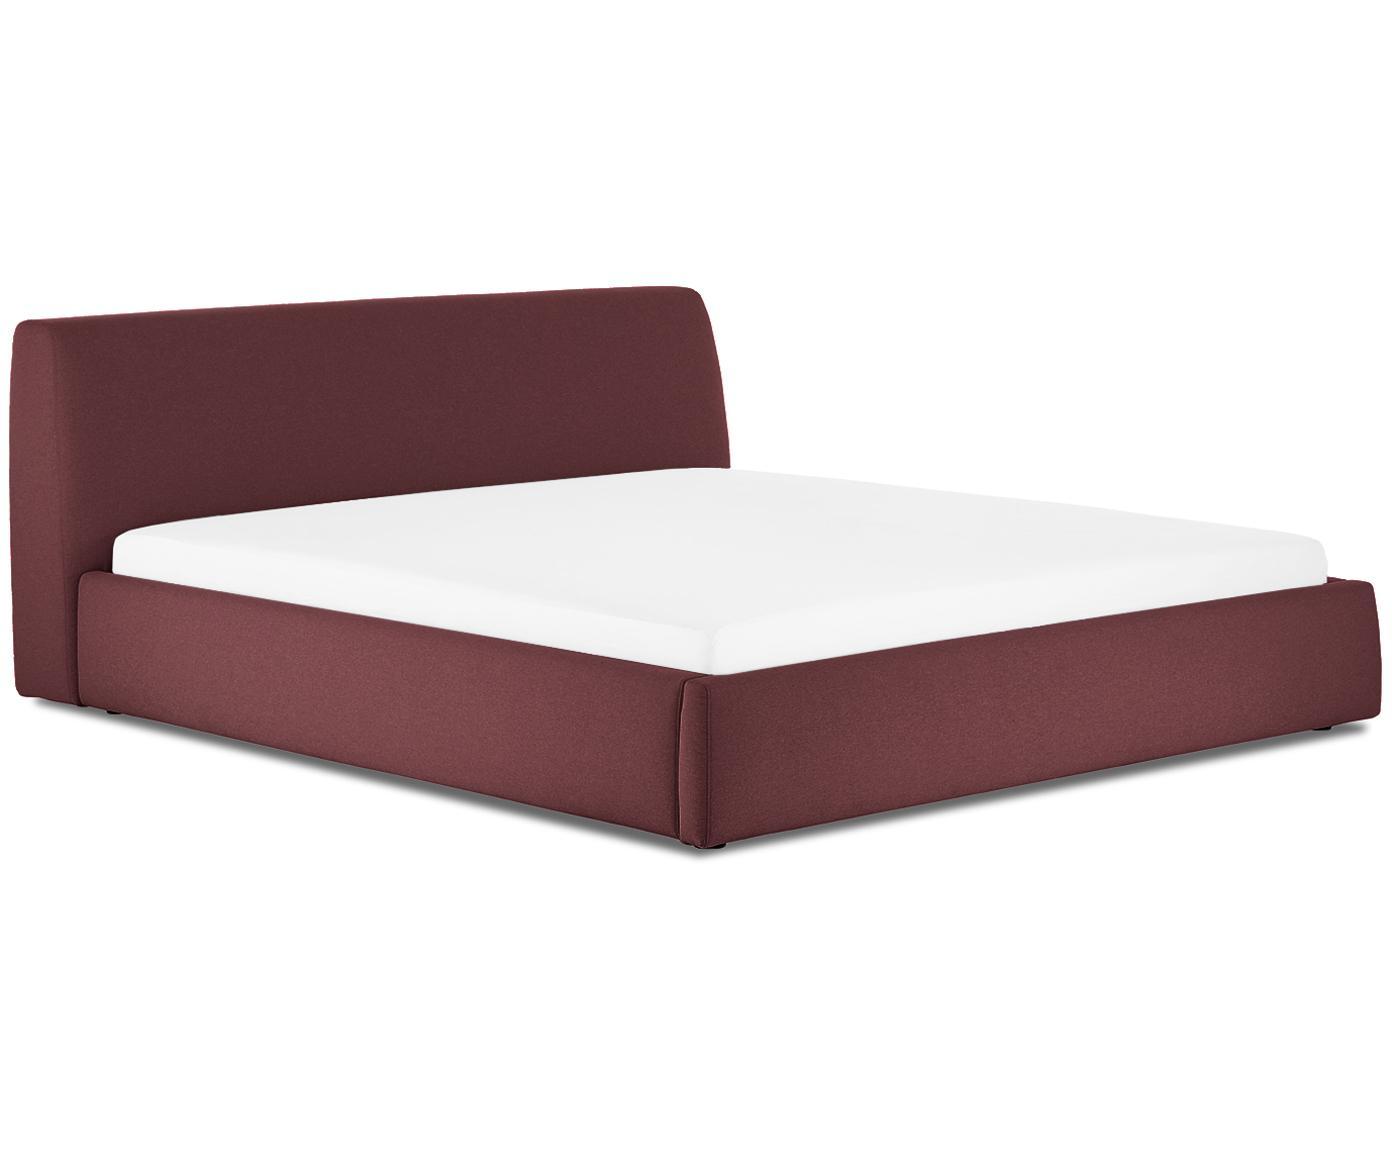 Gestoffeerd bed Cloud, Frame: massief grenenhout, Bekleding: polyester (structuurmater, Bordeauxrood, 160 x 200 cm